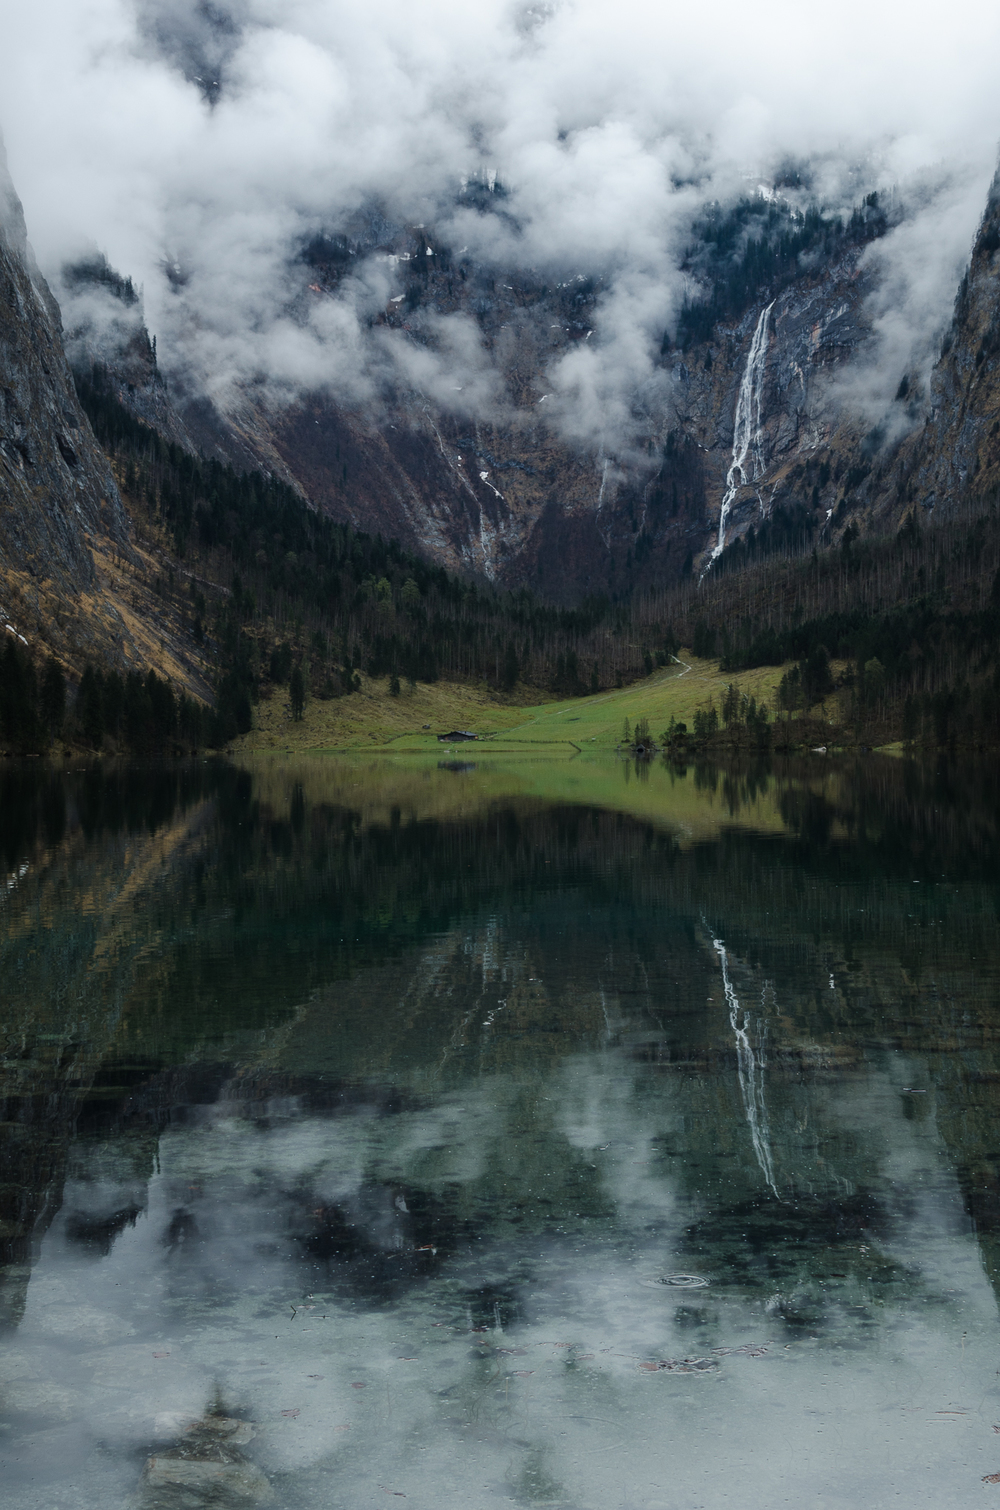 20160406_berchtesgaden_obersee_fischunkelam_christoph_schlein-7145.jpg